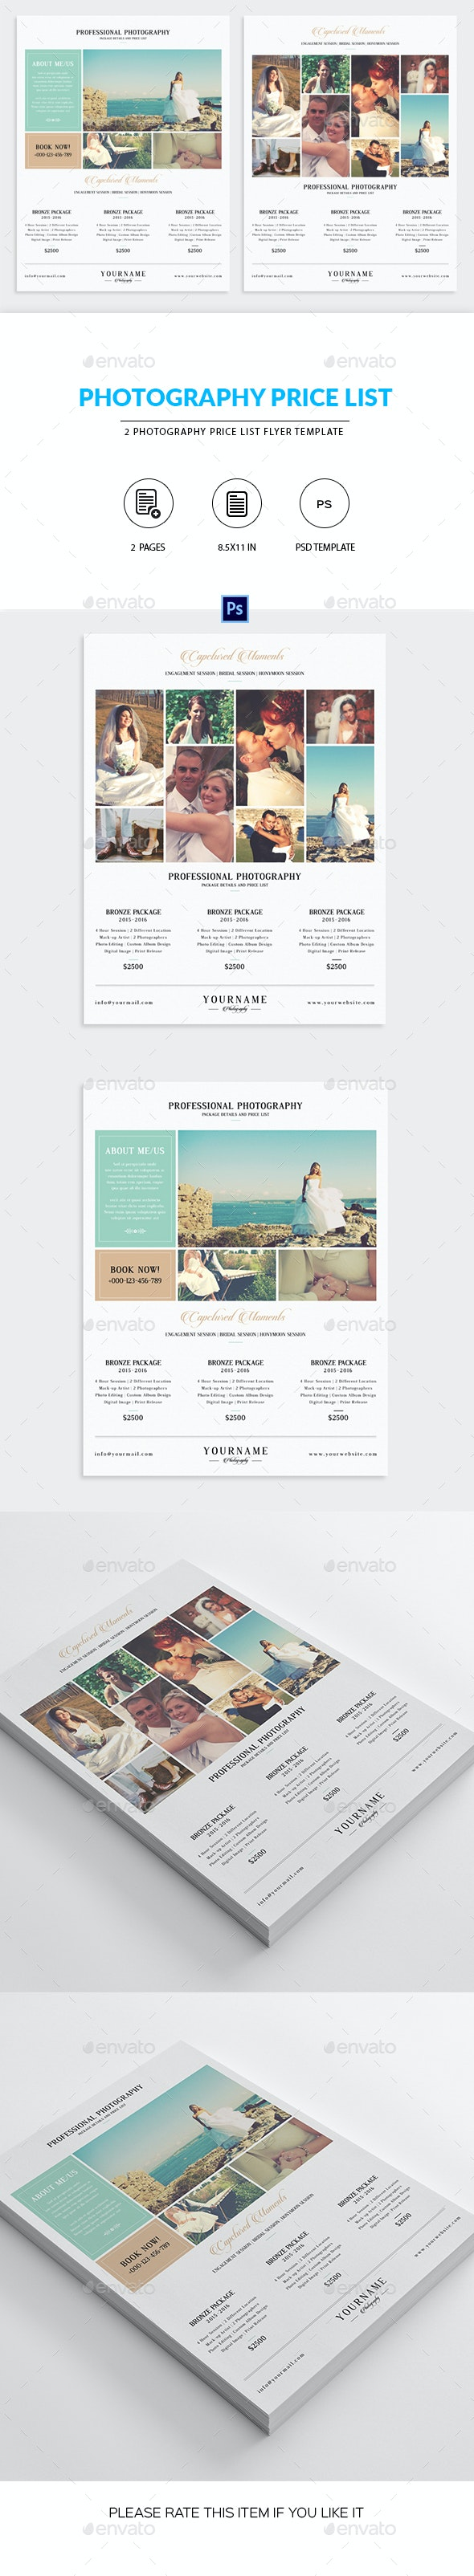 Minimal Photography Price List Marketing Flyer - Corporate Flyers